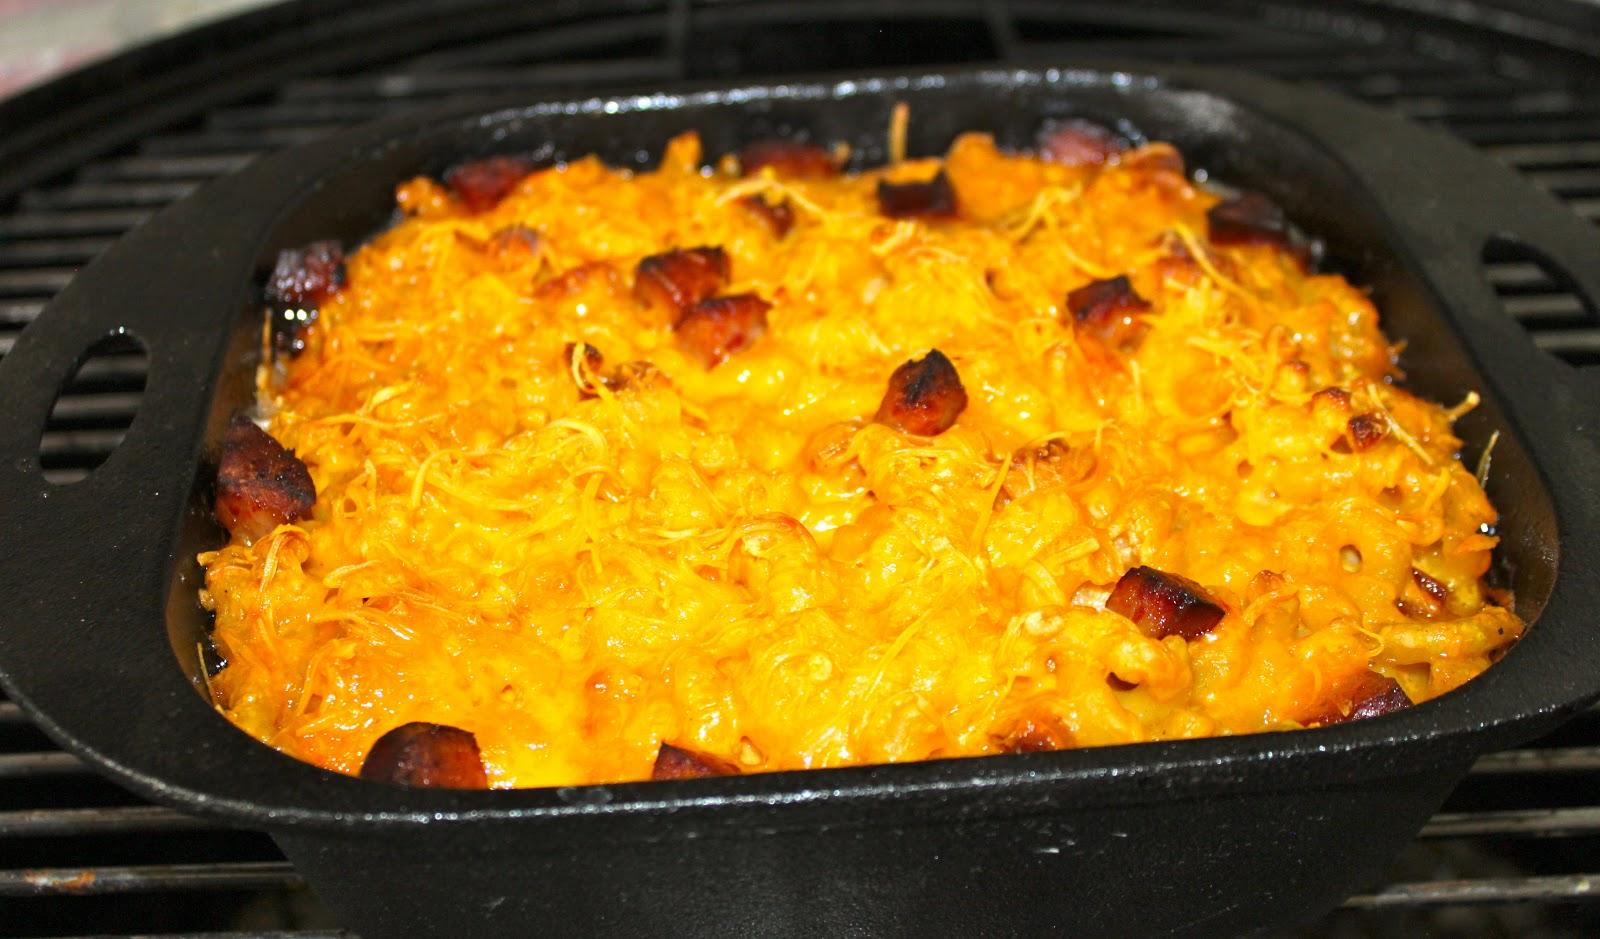 GOBLUEBBQ: Smoked Mac and Cheese w/ Kielbasa